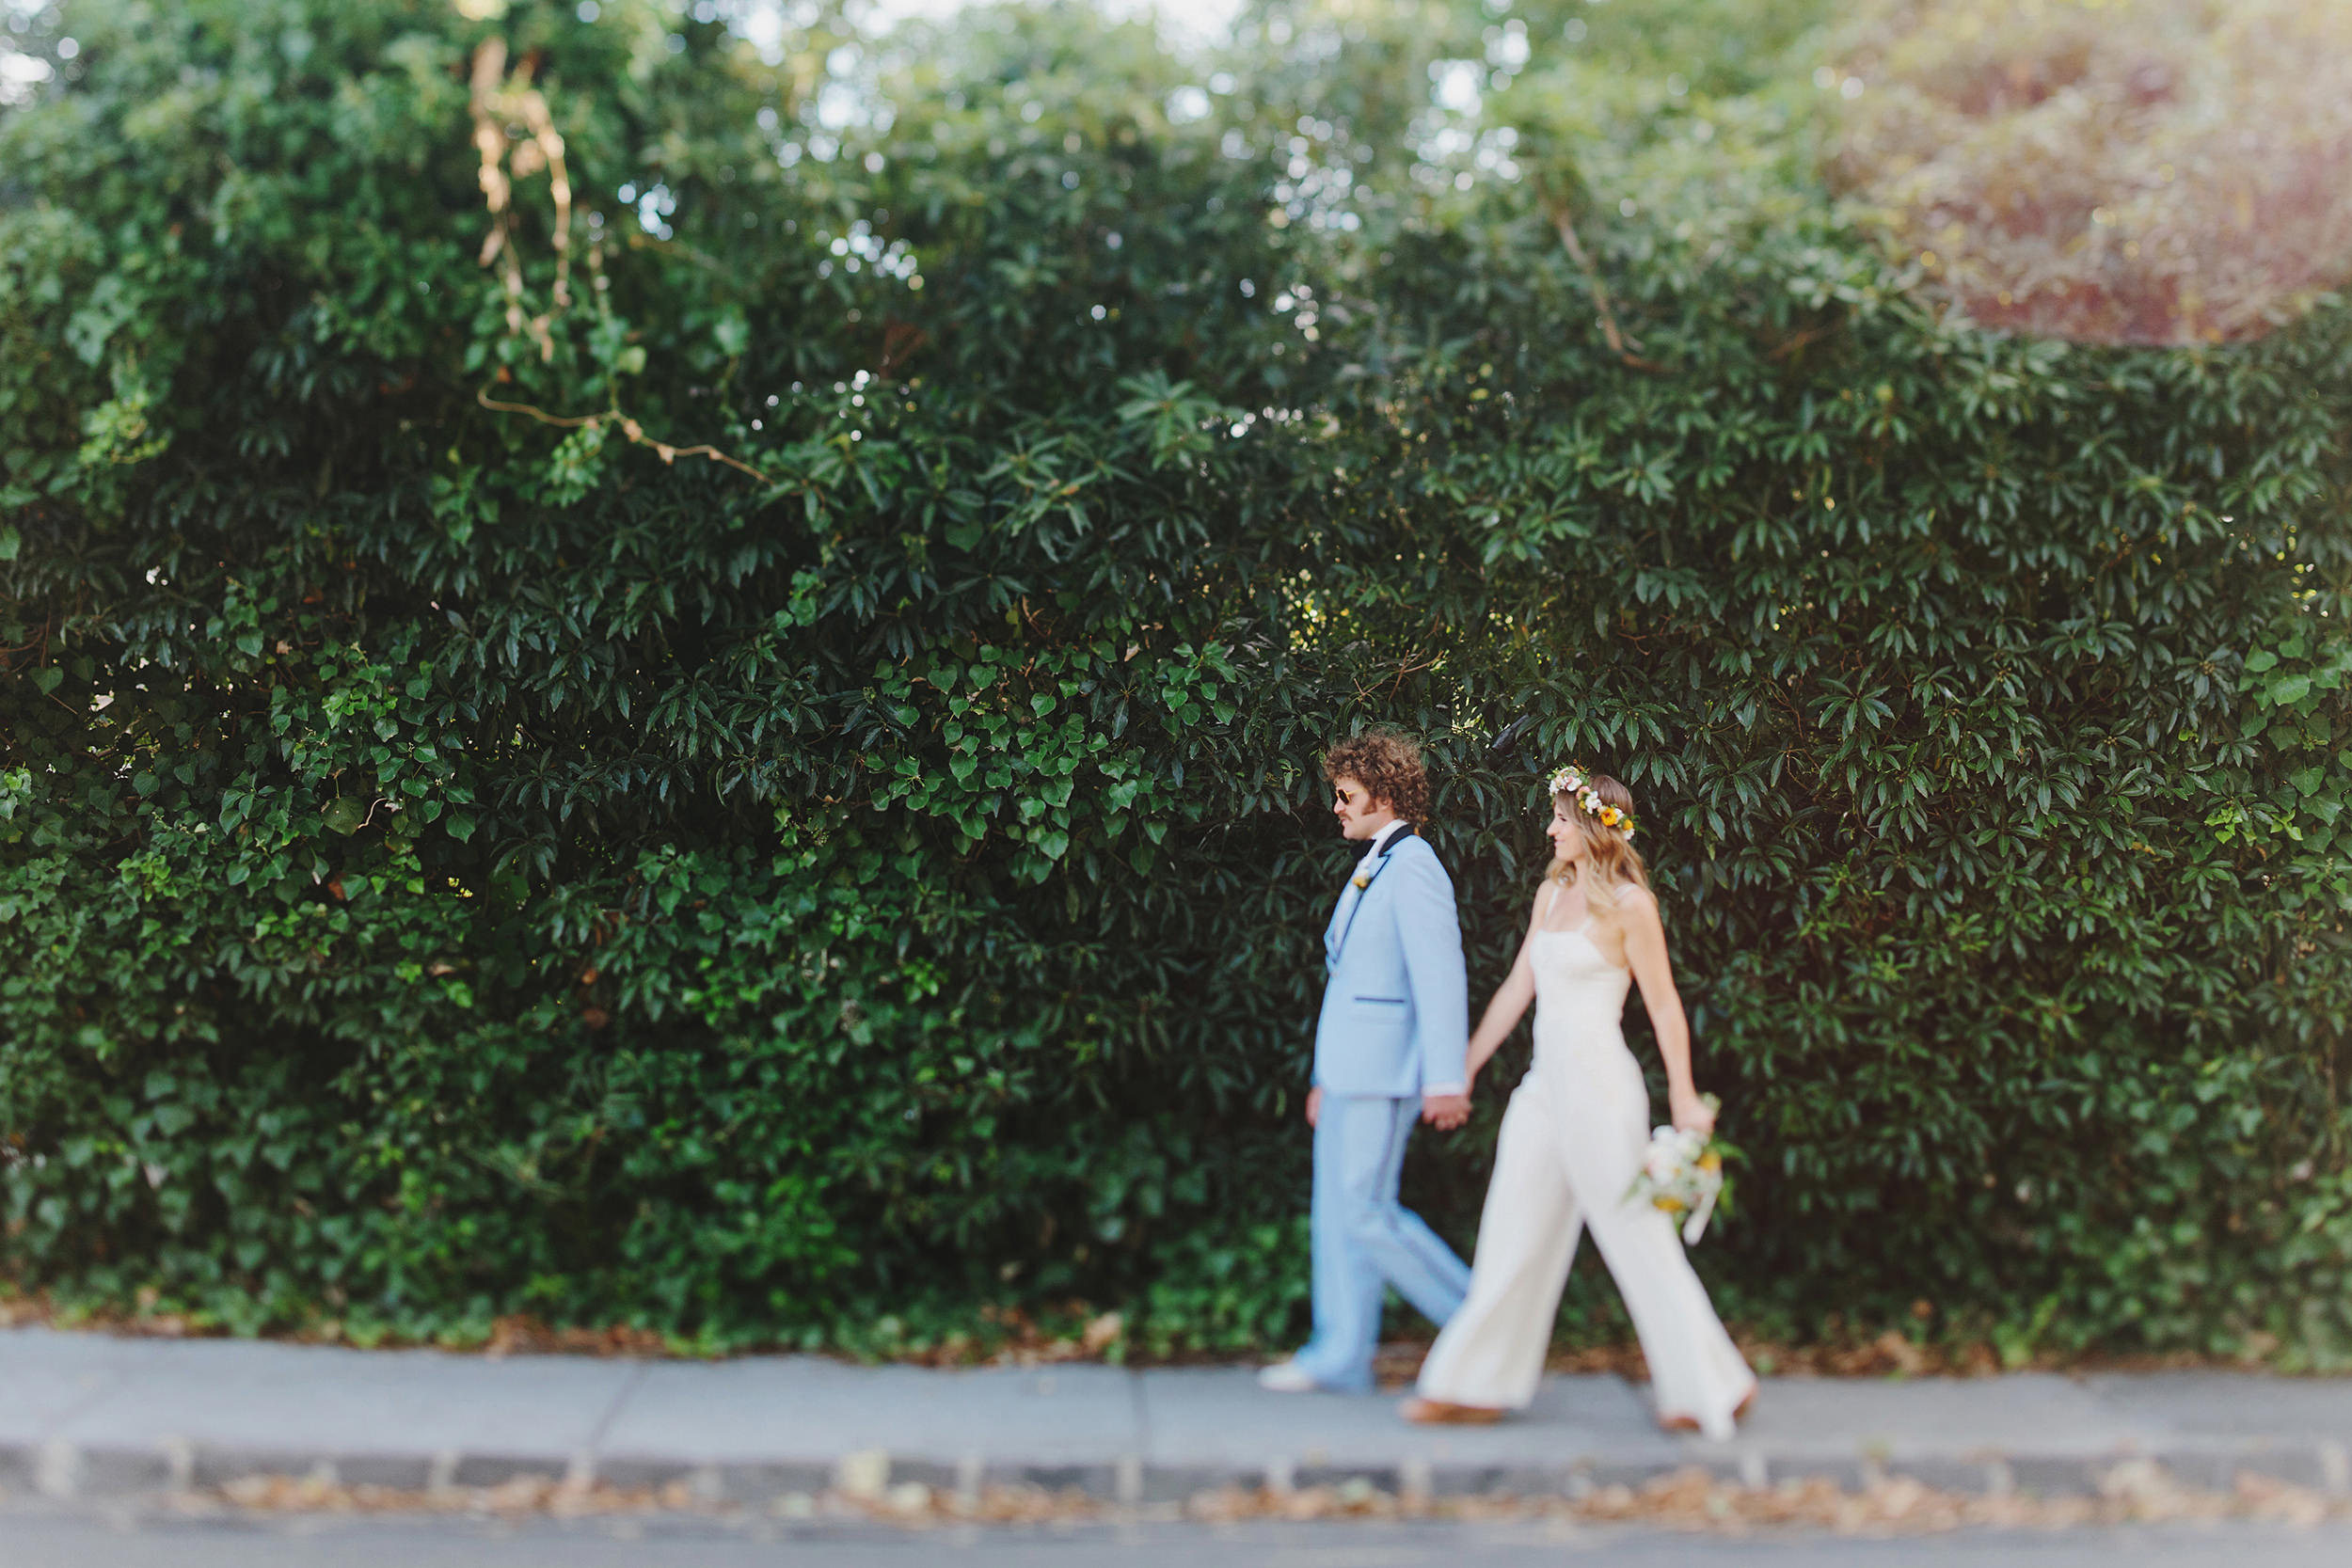 Melbourne_Vintage_Backyard_Wedding_Ben_Erin 058.JPG